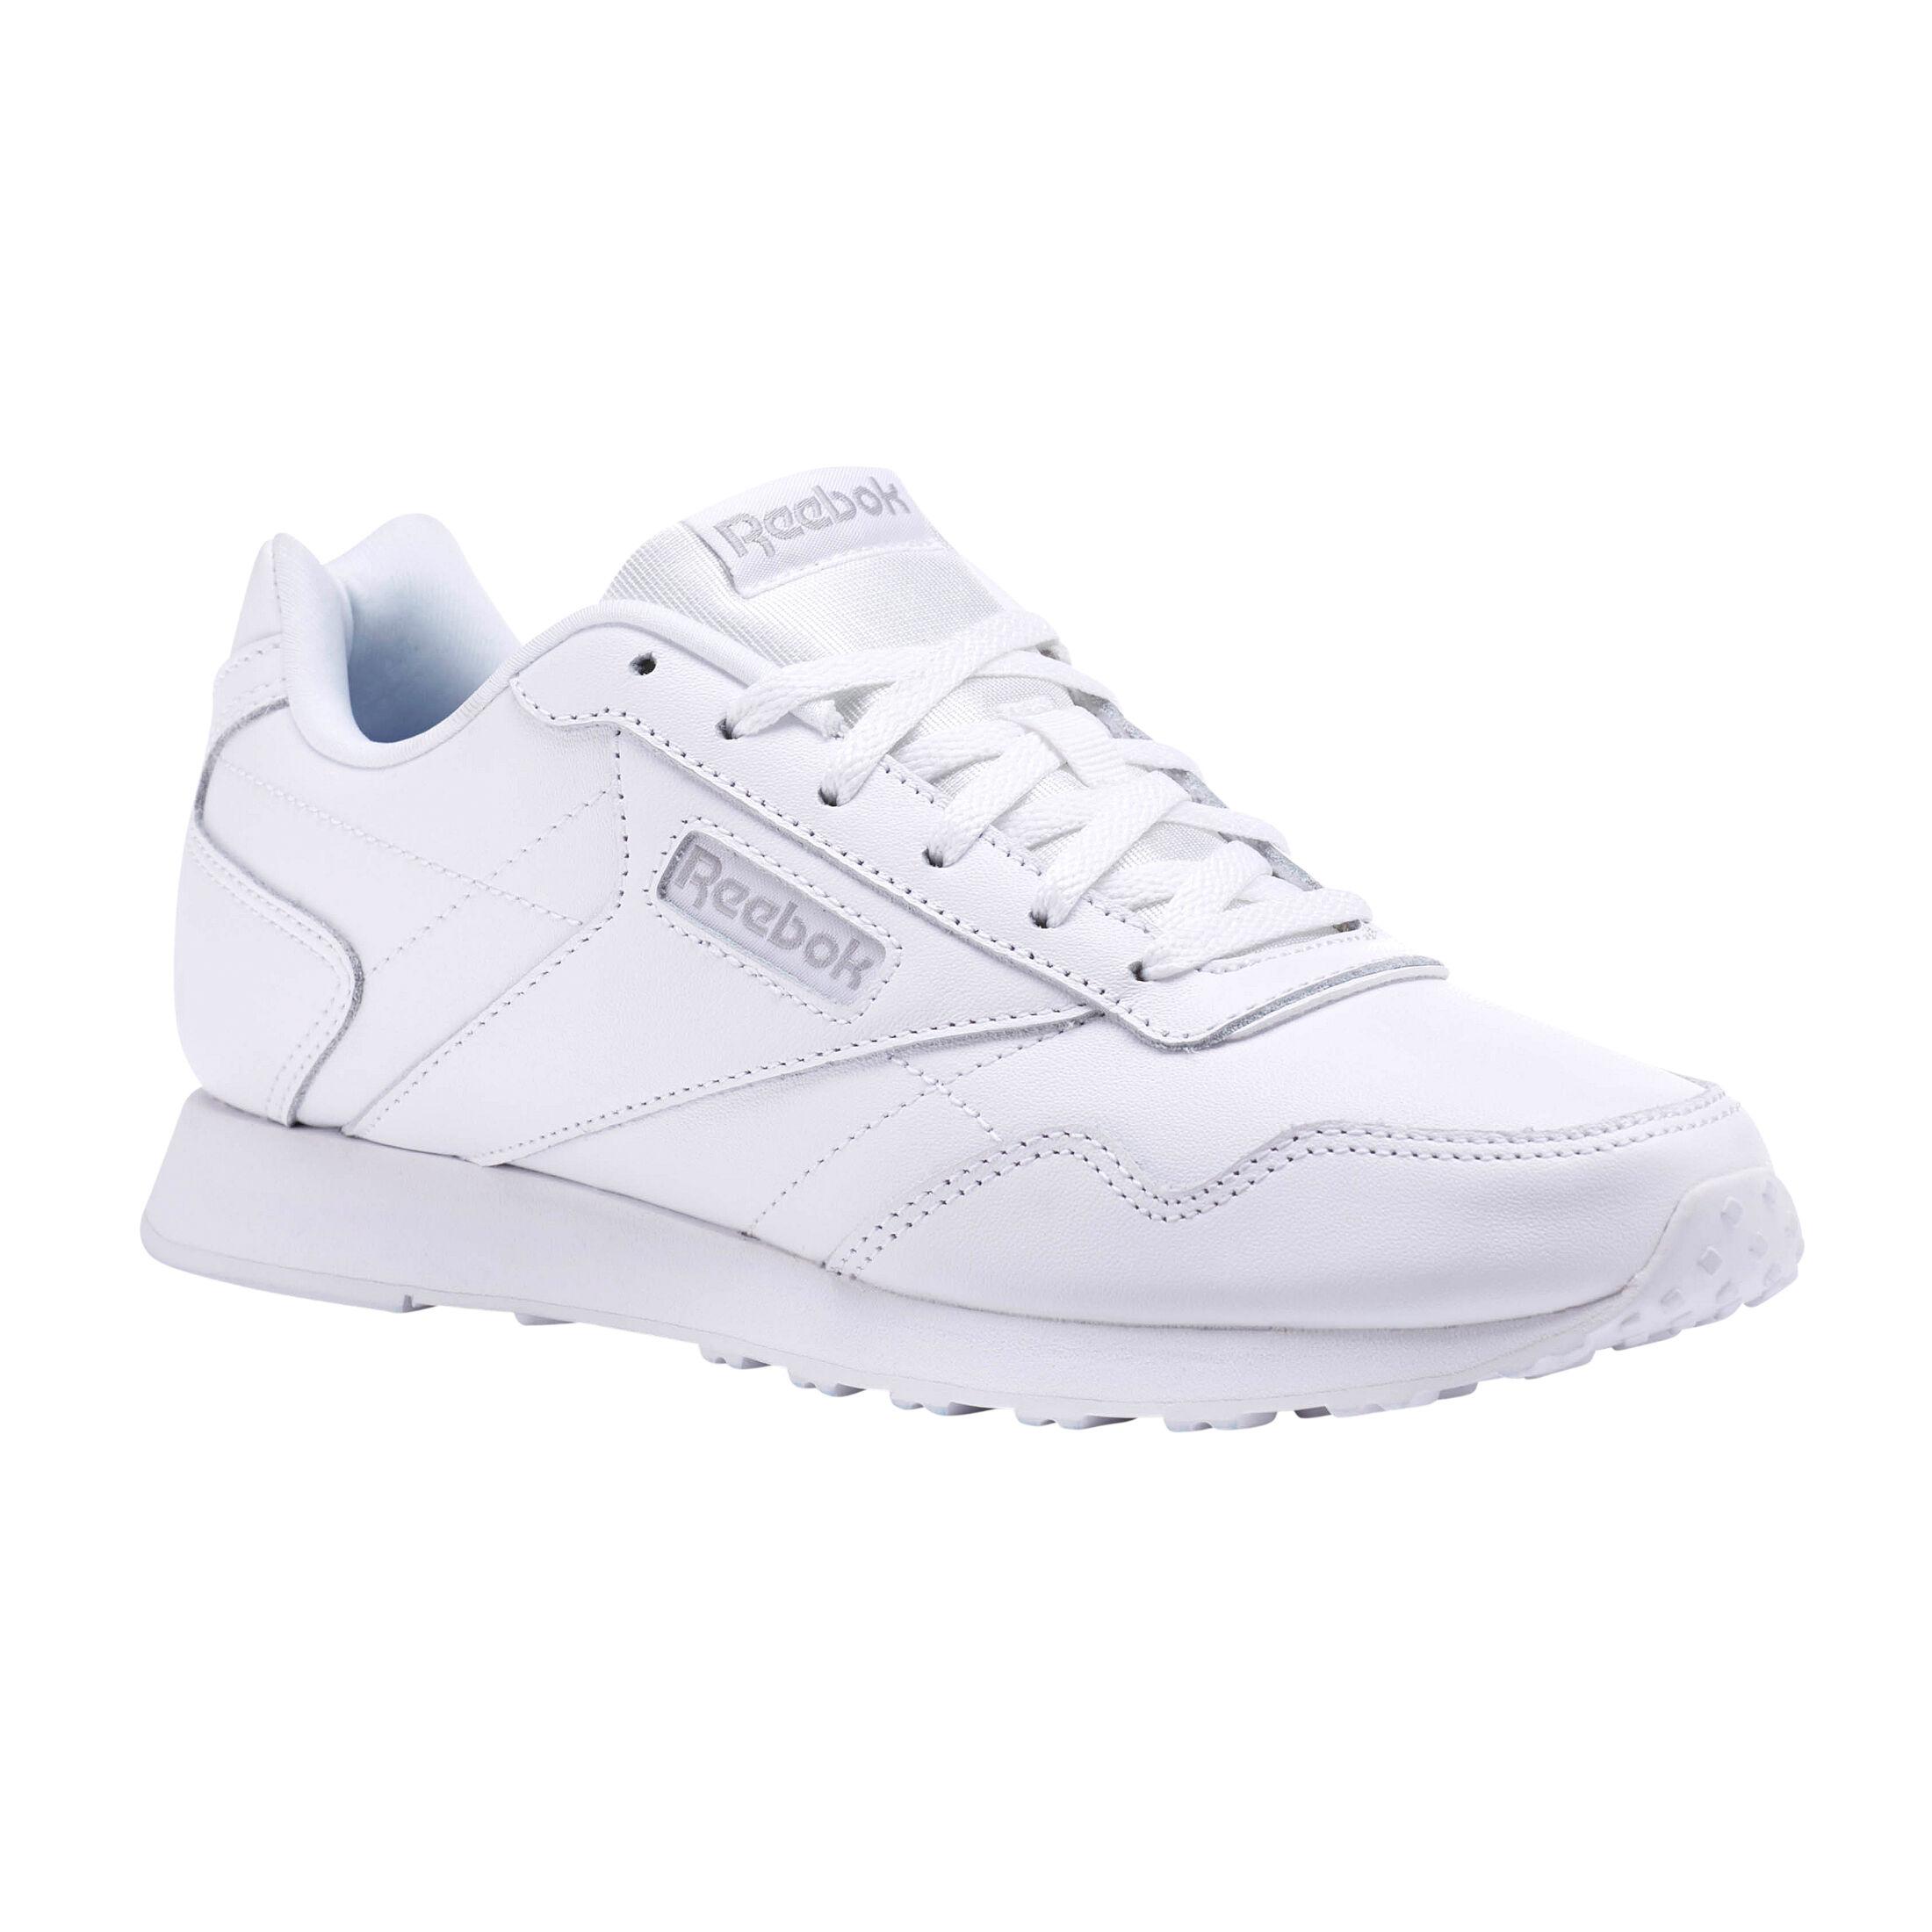 Reebok Royal Glide LX Sneaker Damen Weiß, Grau online